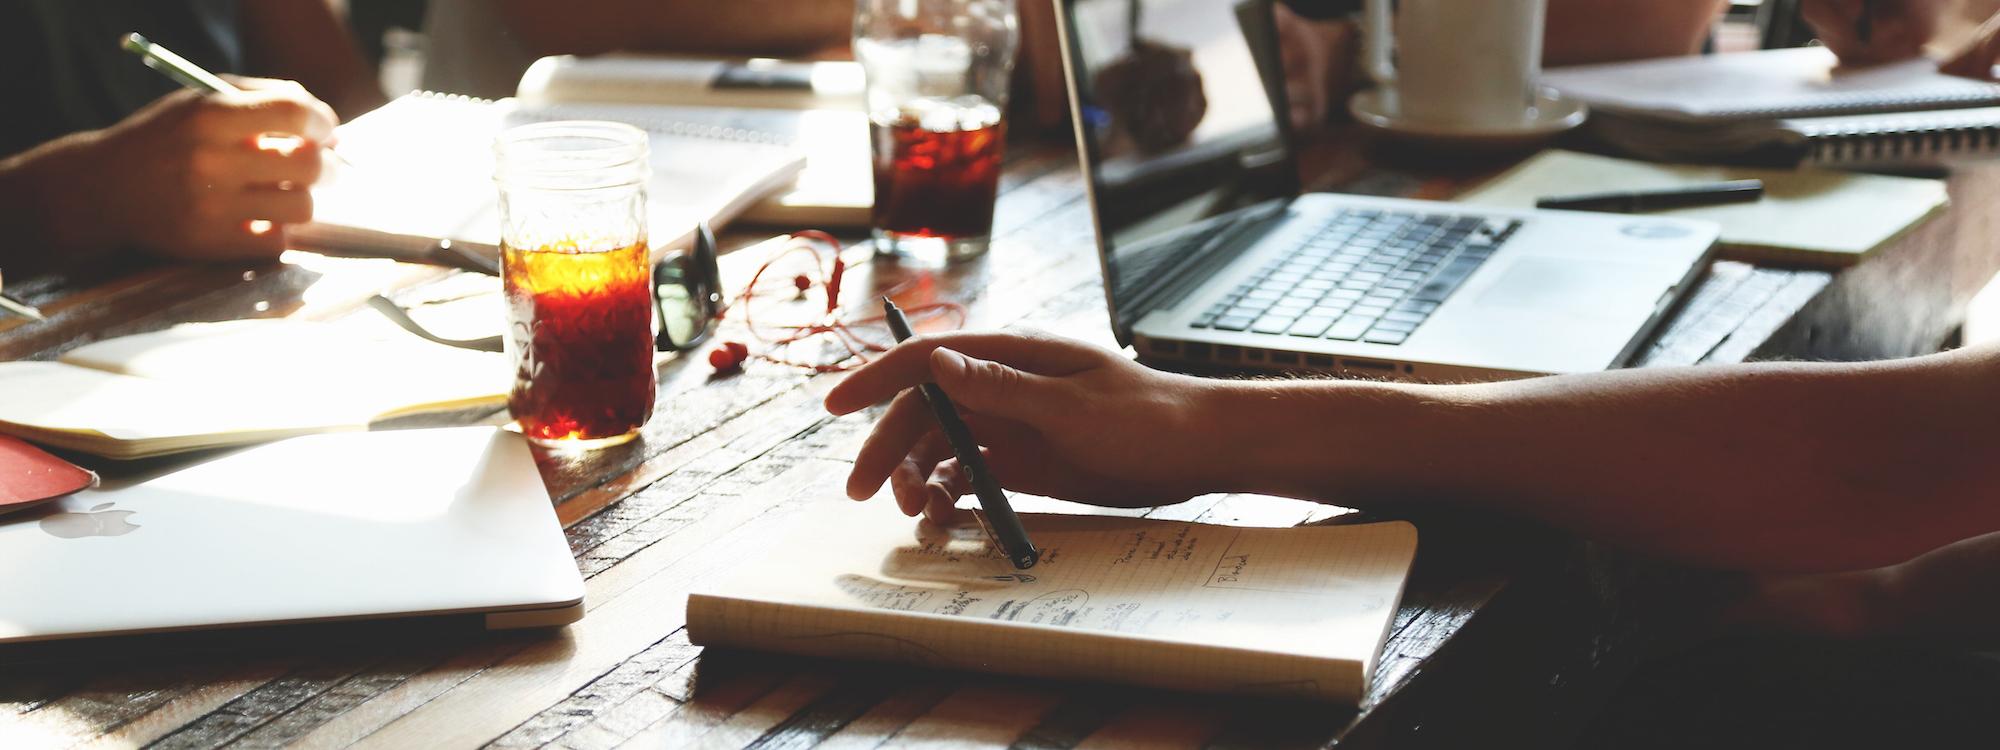 How to run design reviews